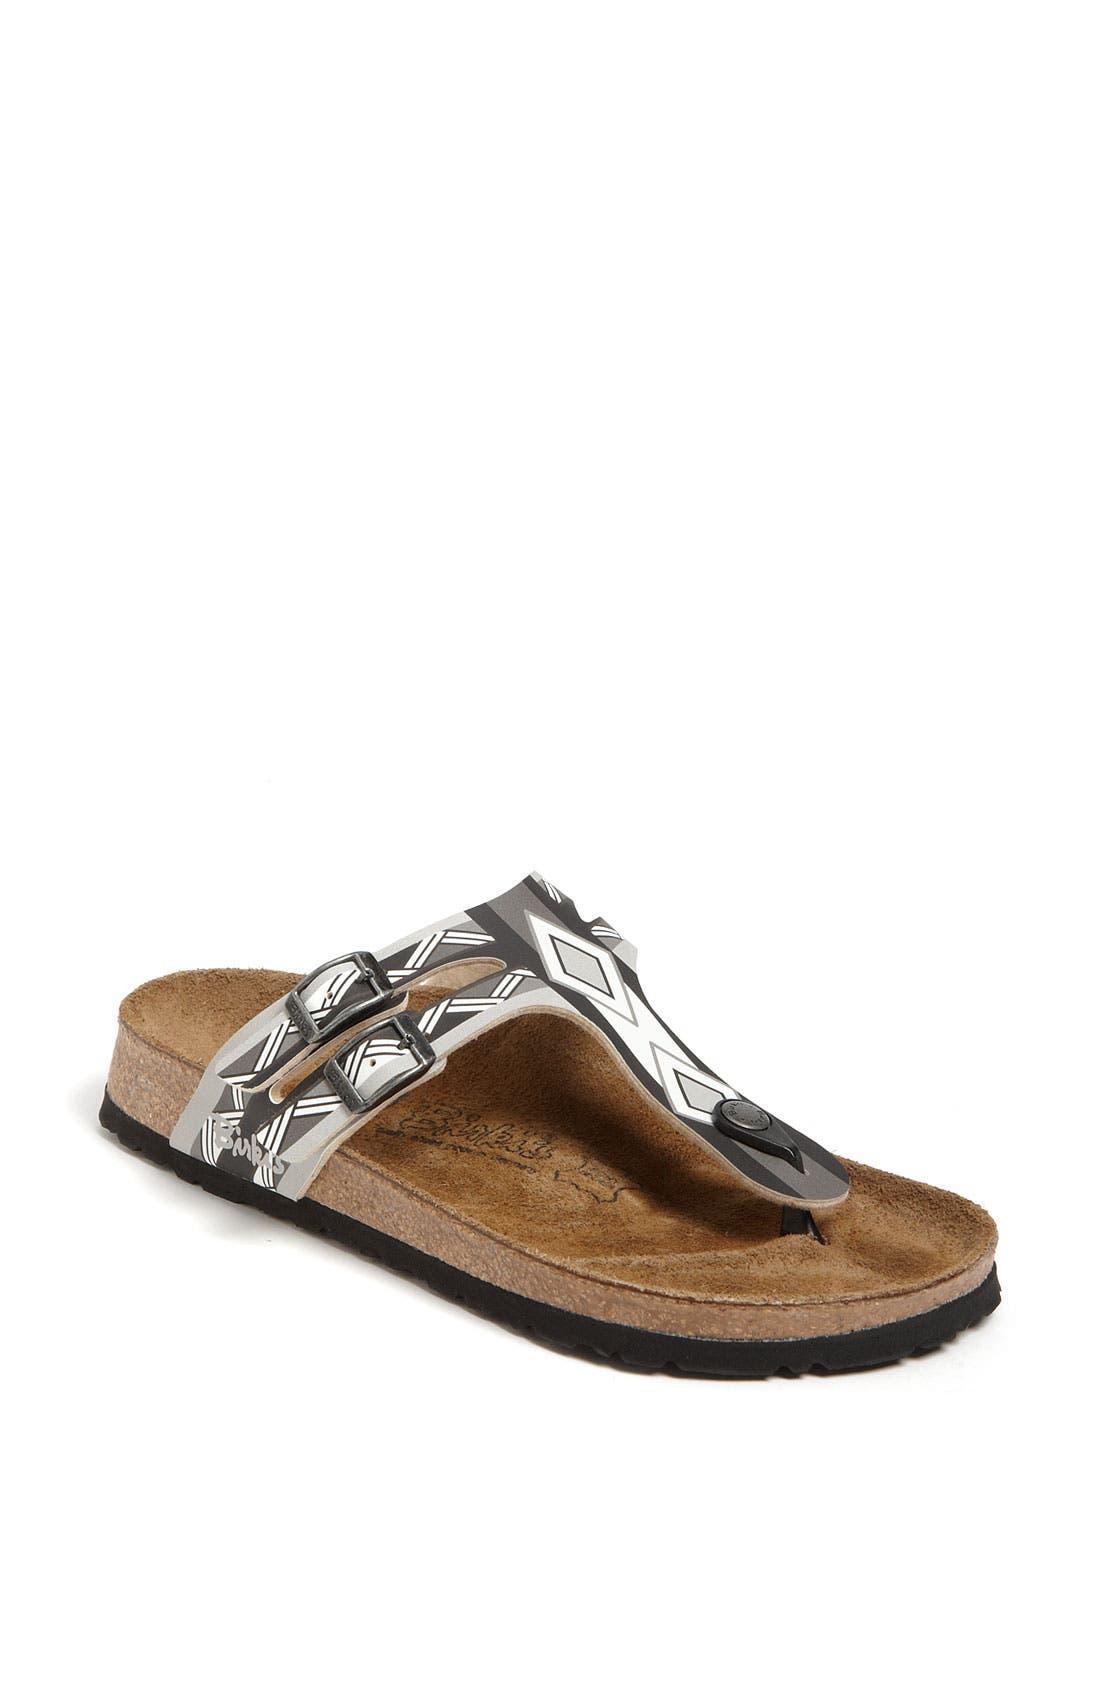 Alternate Image 1 Selected - Birki's® 'Milos' Sandal